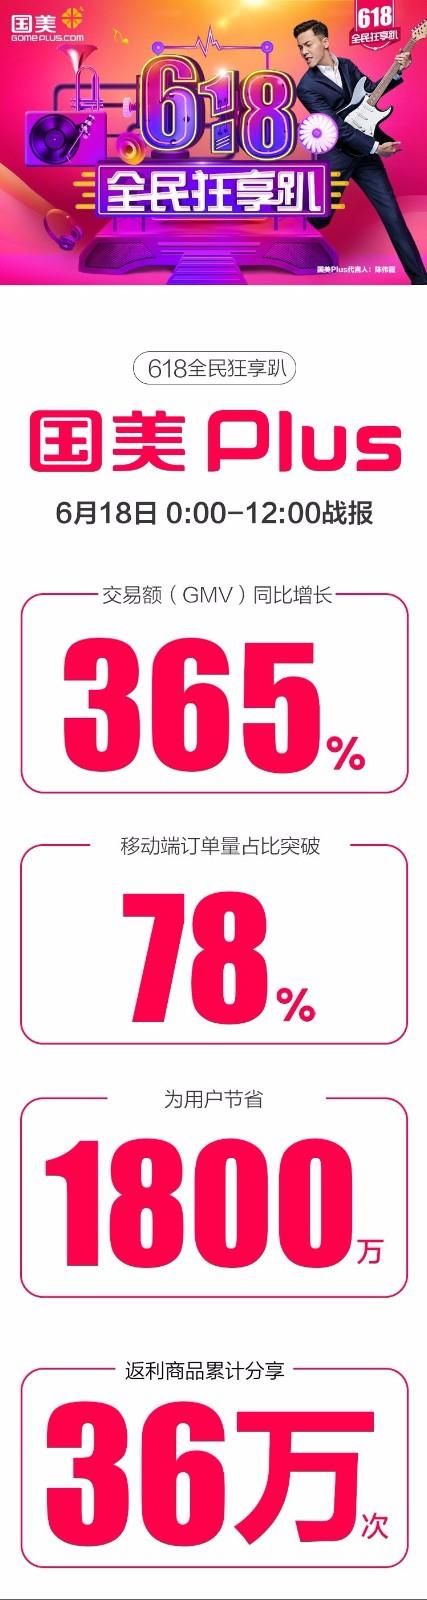 GMV同比猛增365%!国美Plus618前12小时销量全线飘红